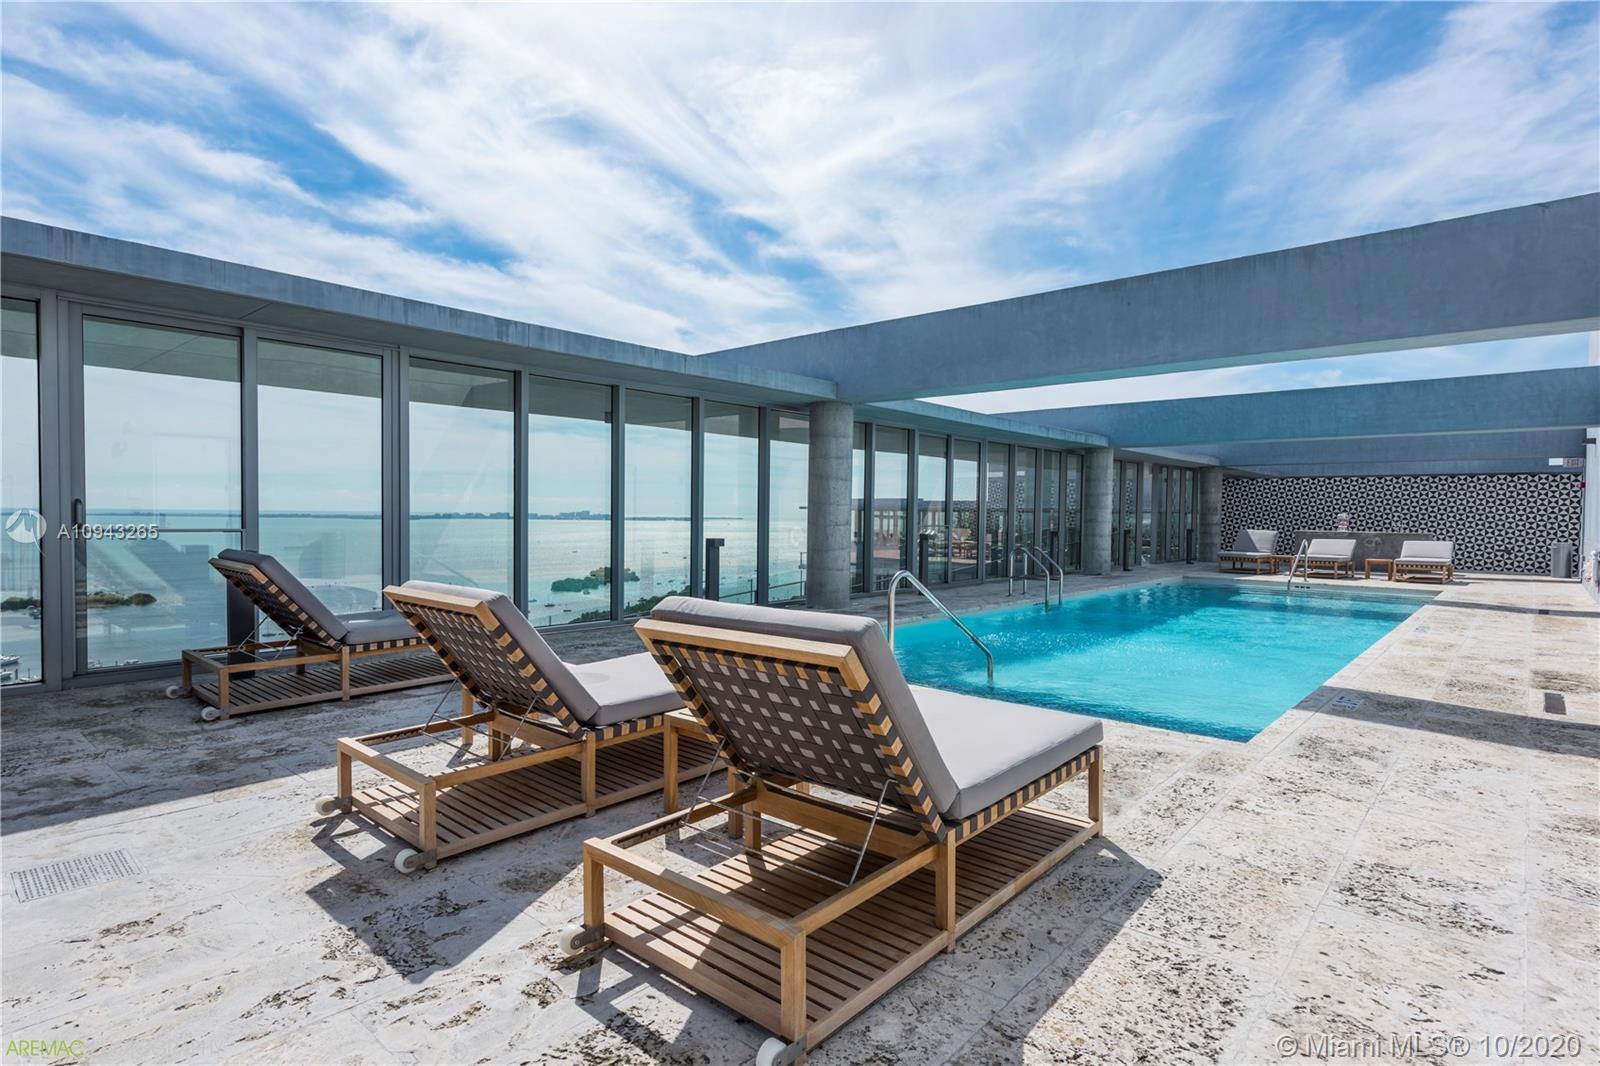 2675 S Bayshore Dr, Unit #2001S Luxury Real Estate